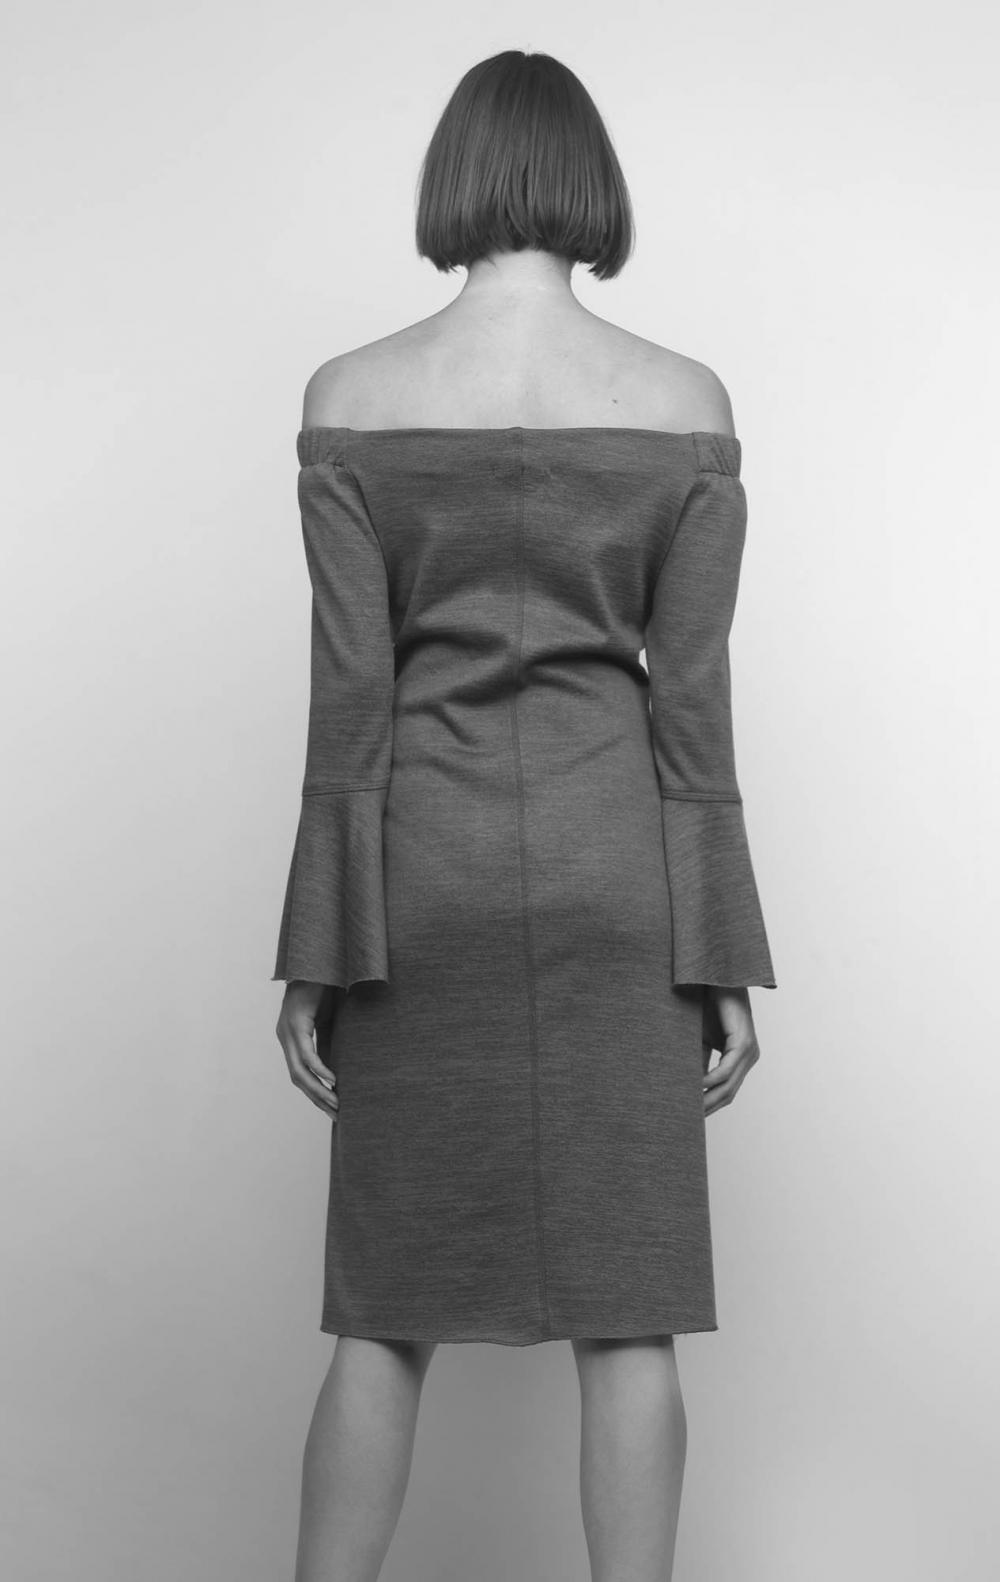 Vestido Cinza Ombro a Ombro Malha - Foto 2